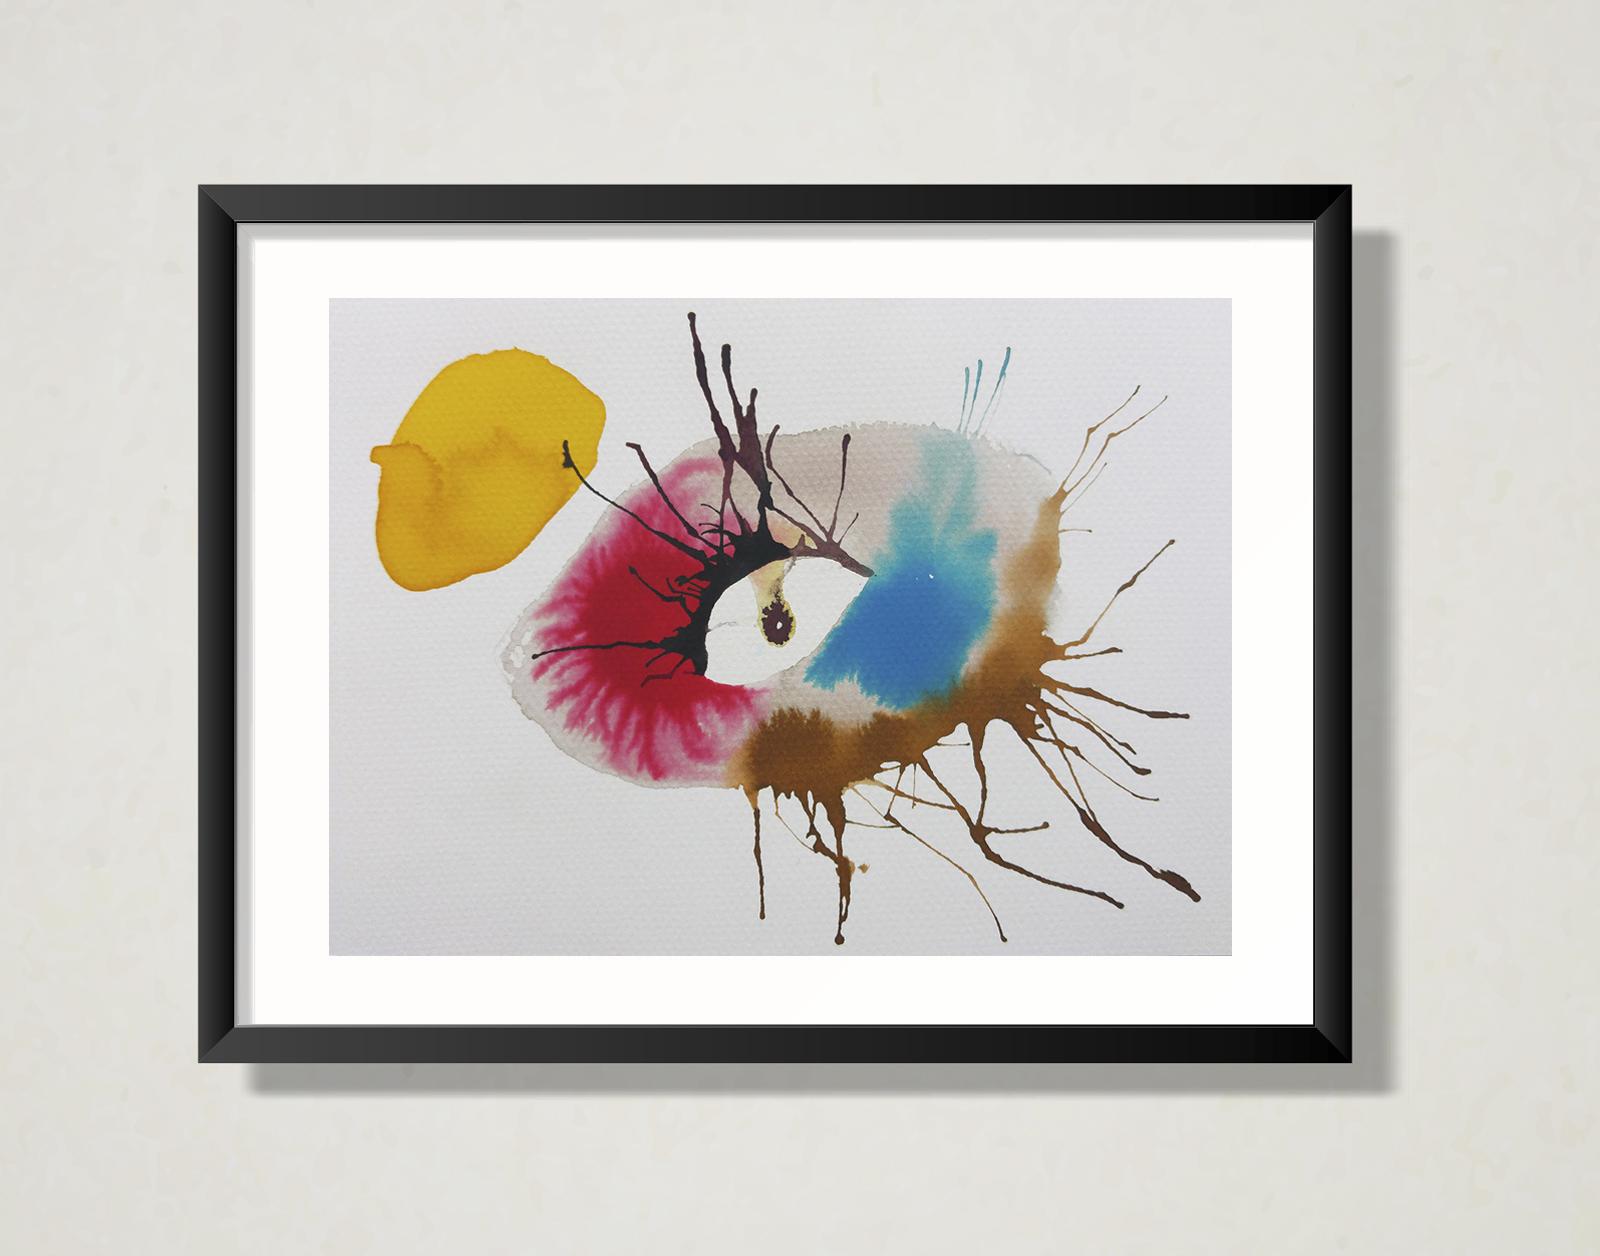 Medusa V (2014) - Fernando Ordóñez